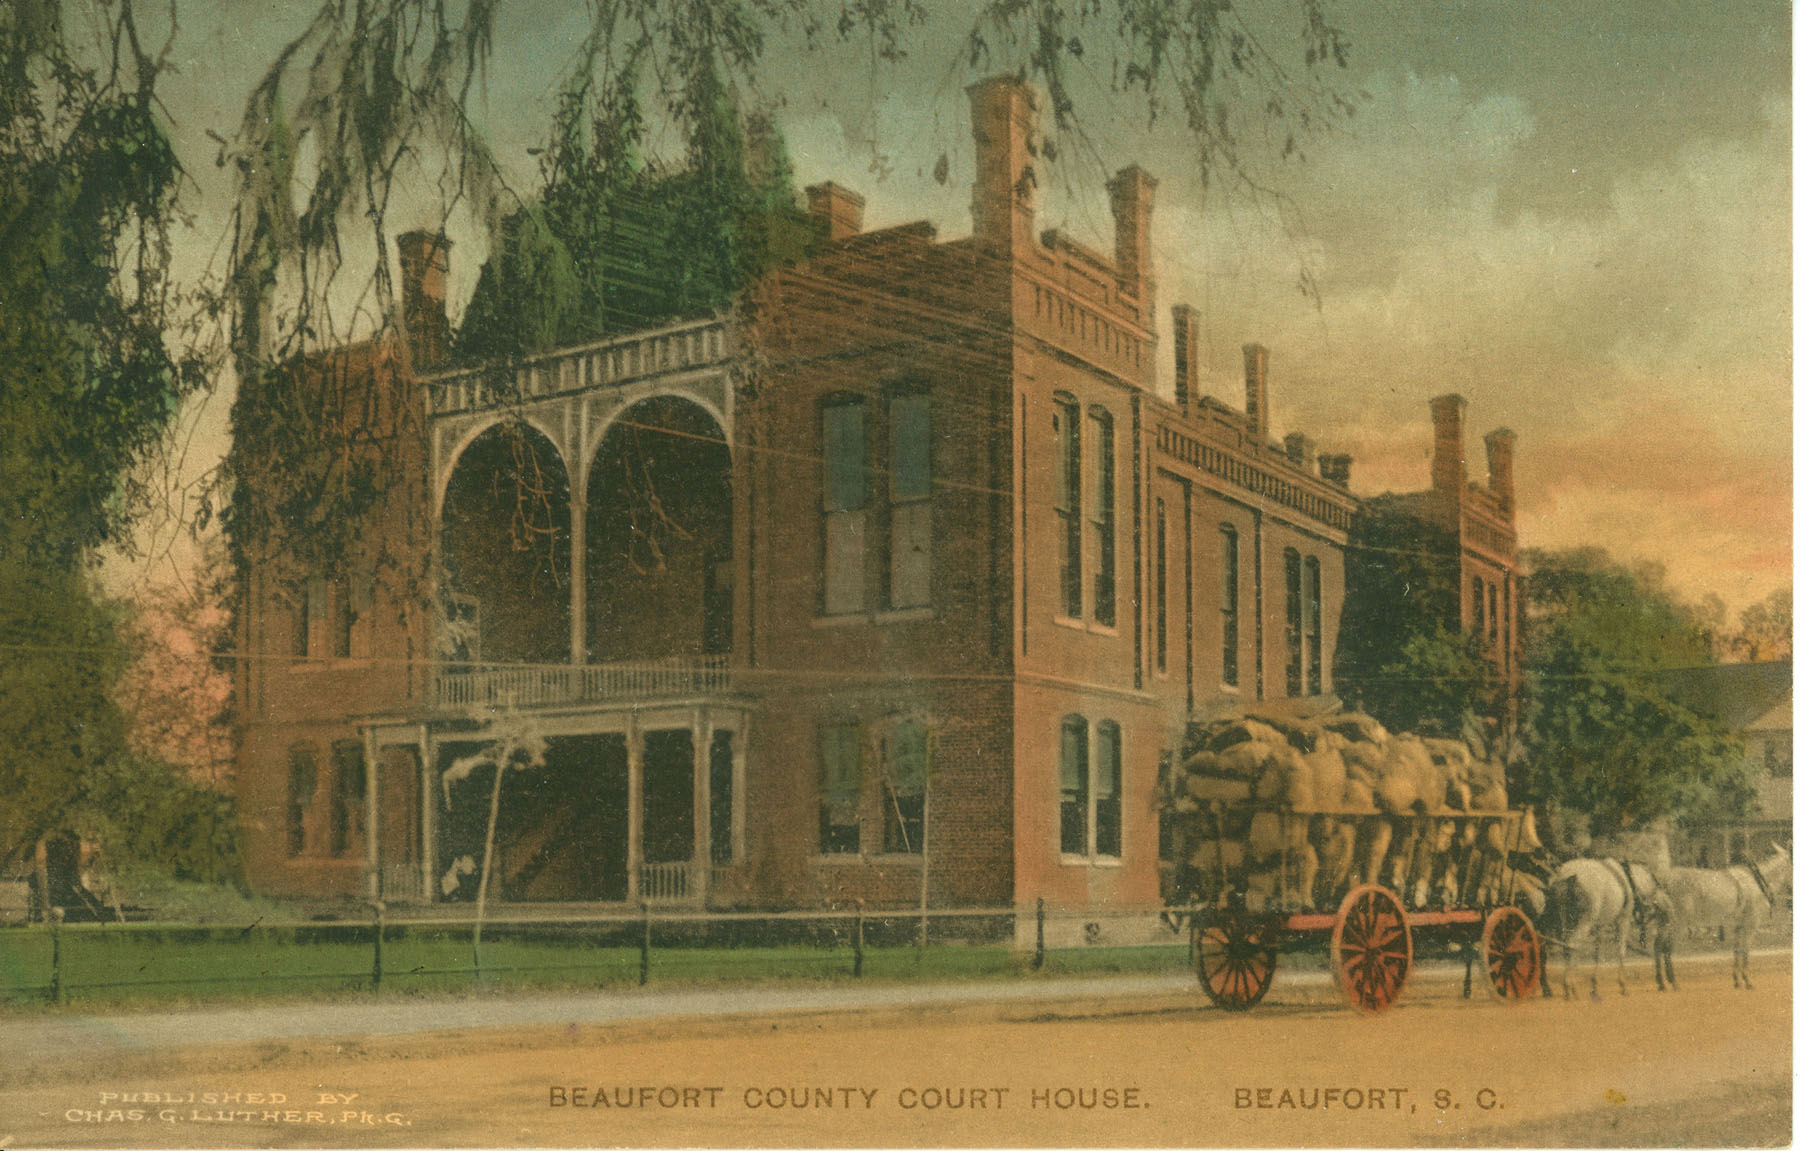 Beaufort County Court House. Beaufort, South Carolina